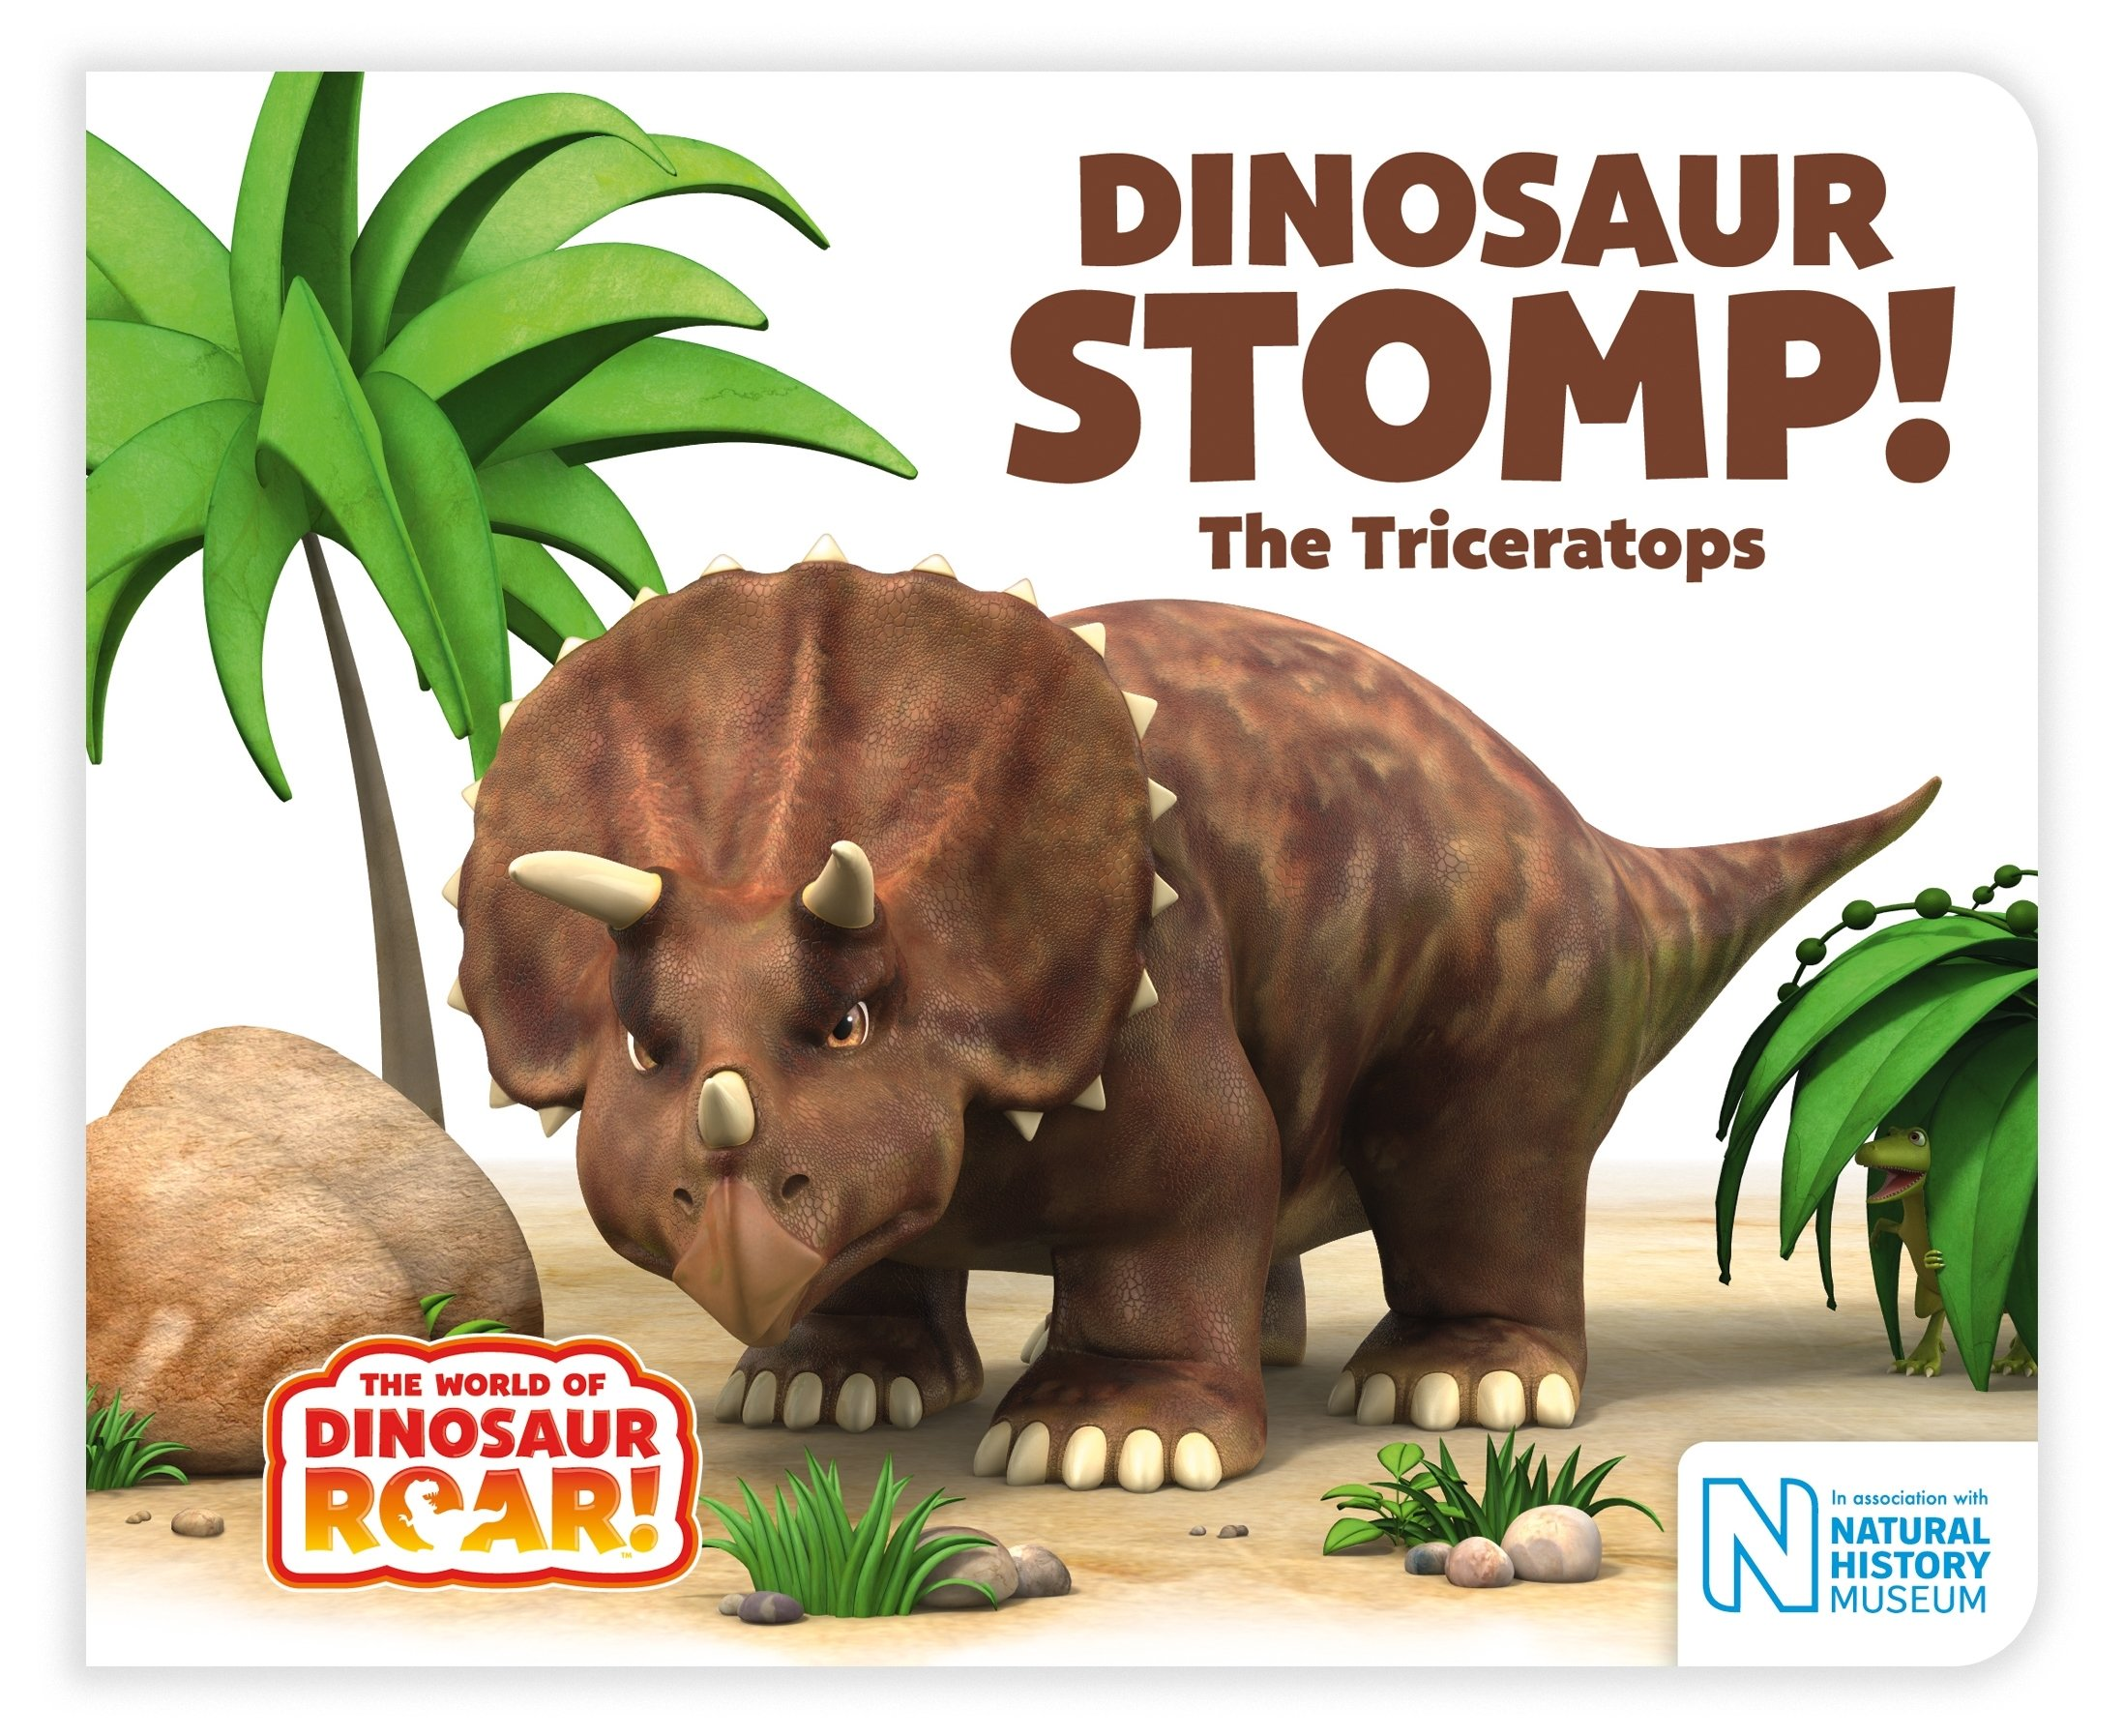 Dinosaur Stomp! The Triceratops The World of Dinosaur Roar